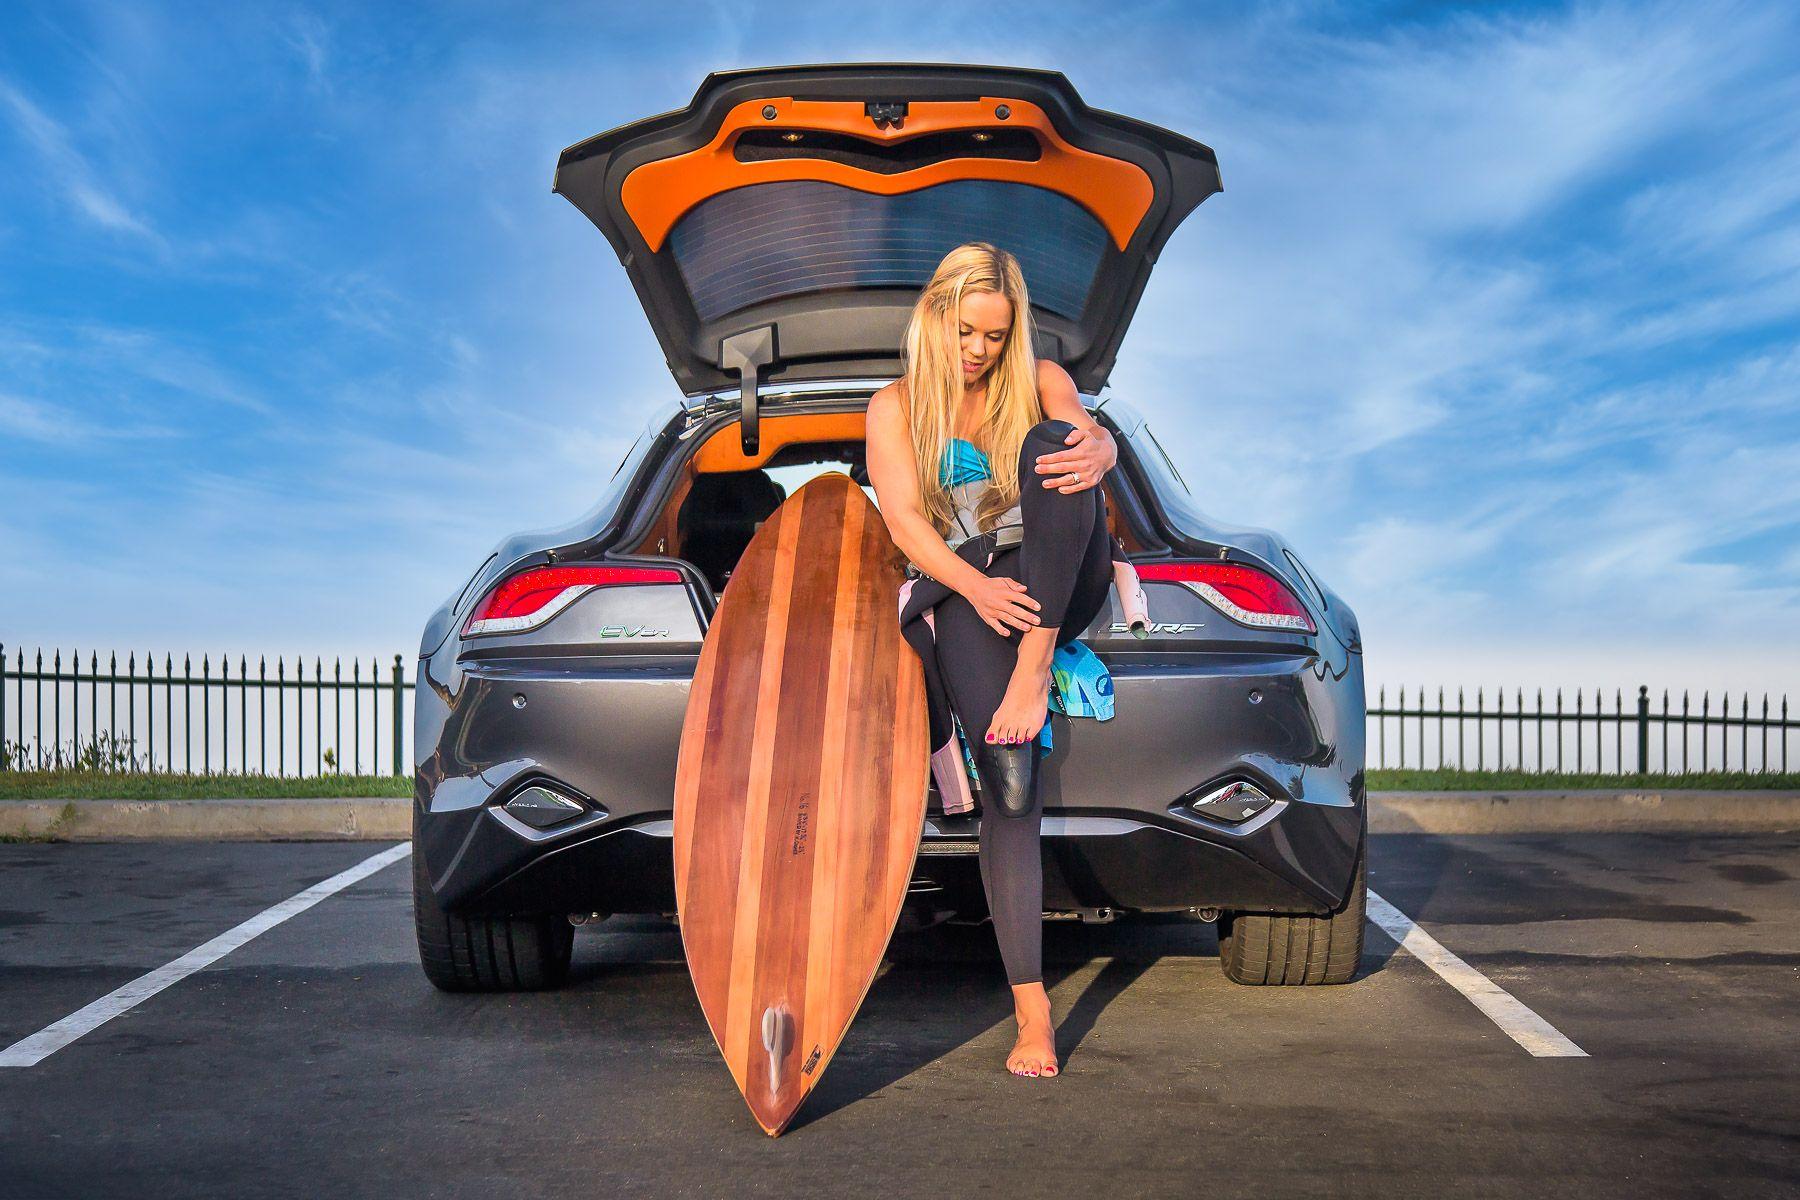 FISKER-SURF-9764-2.jpg